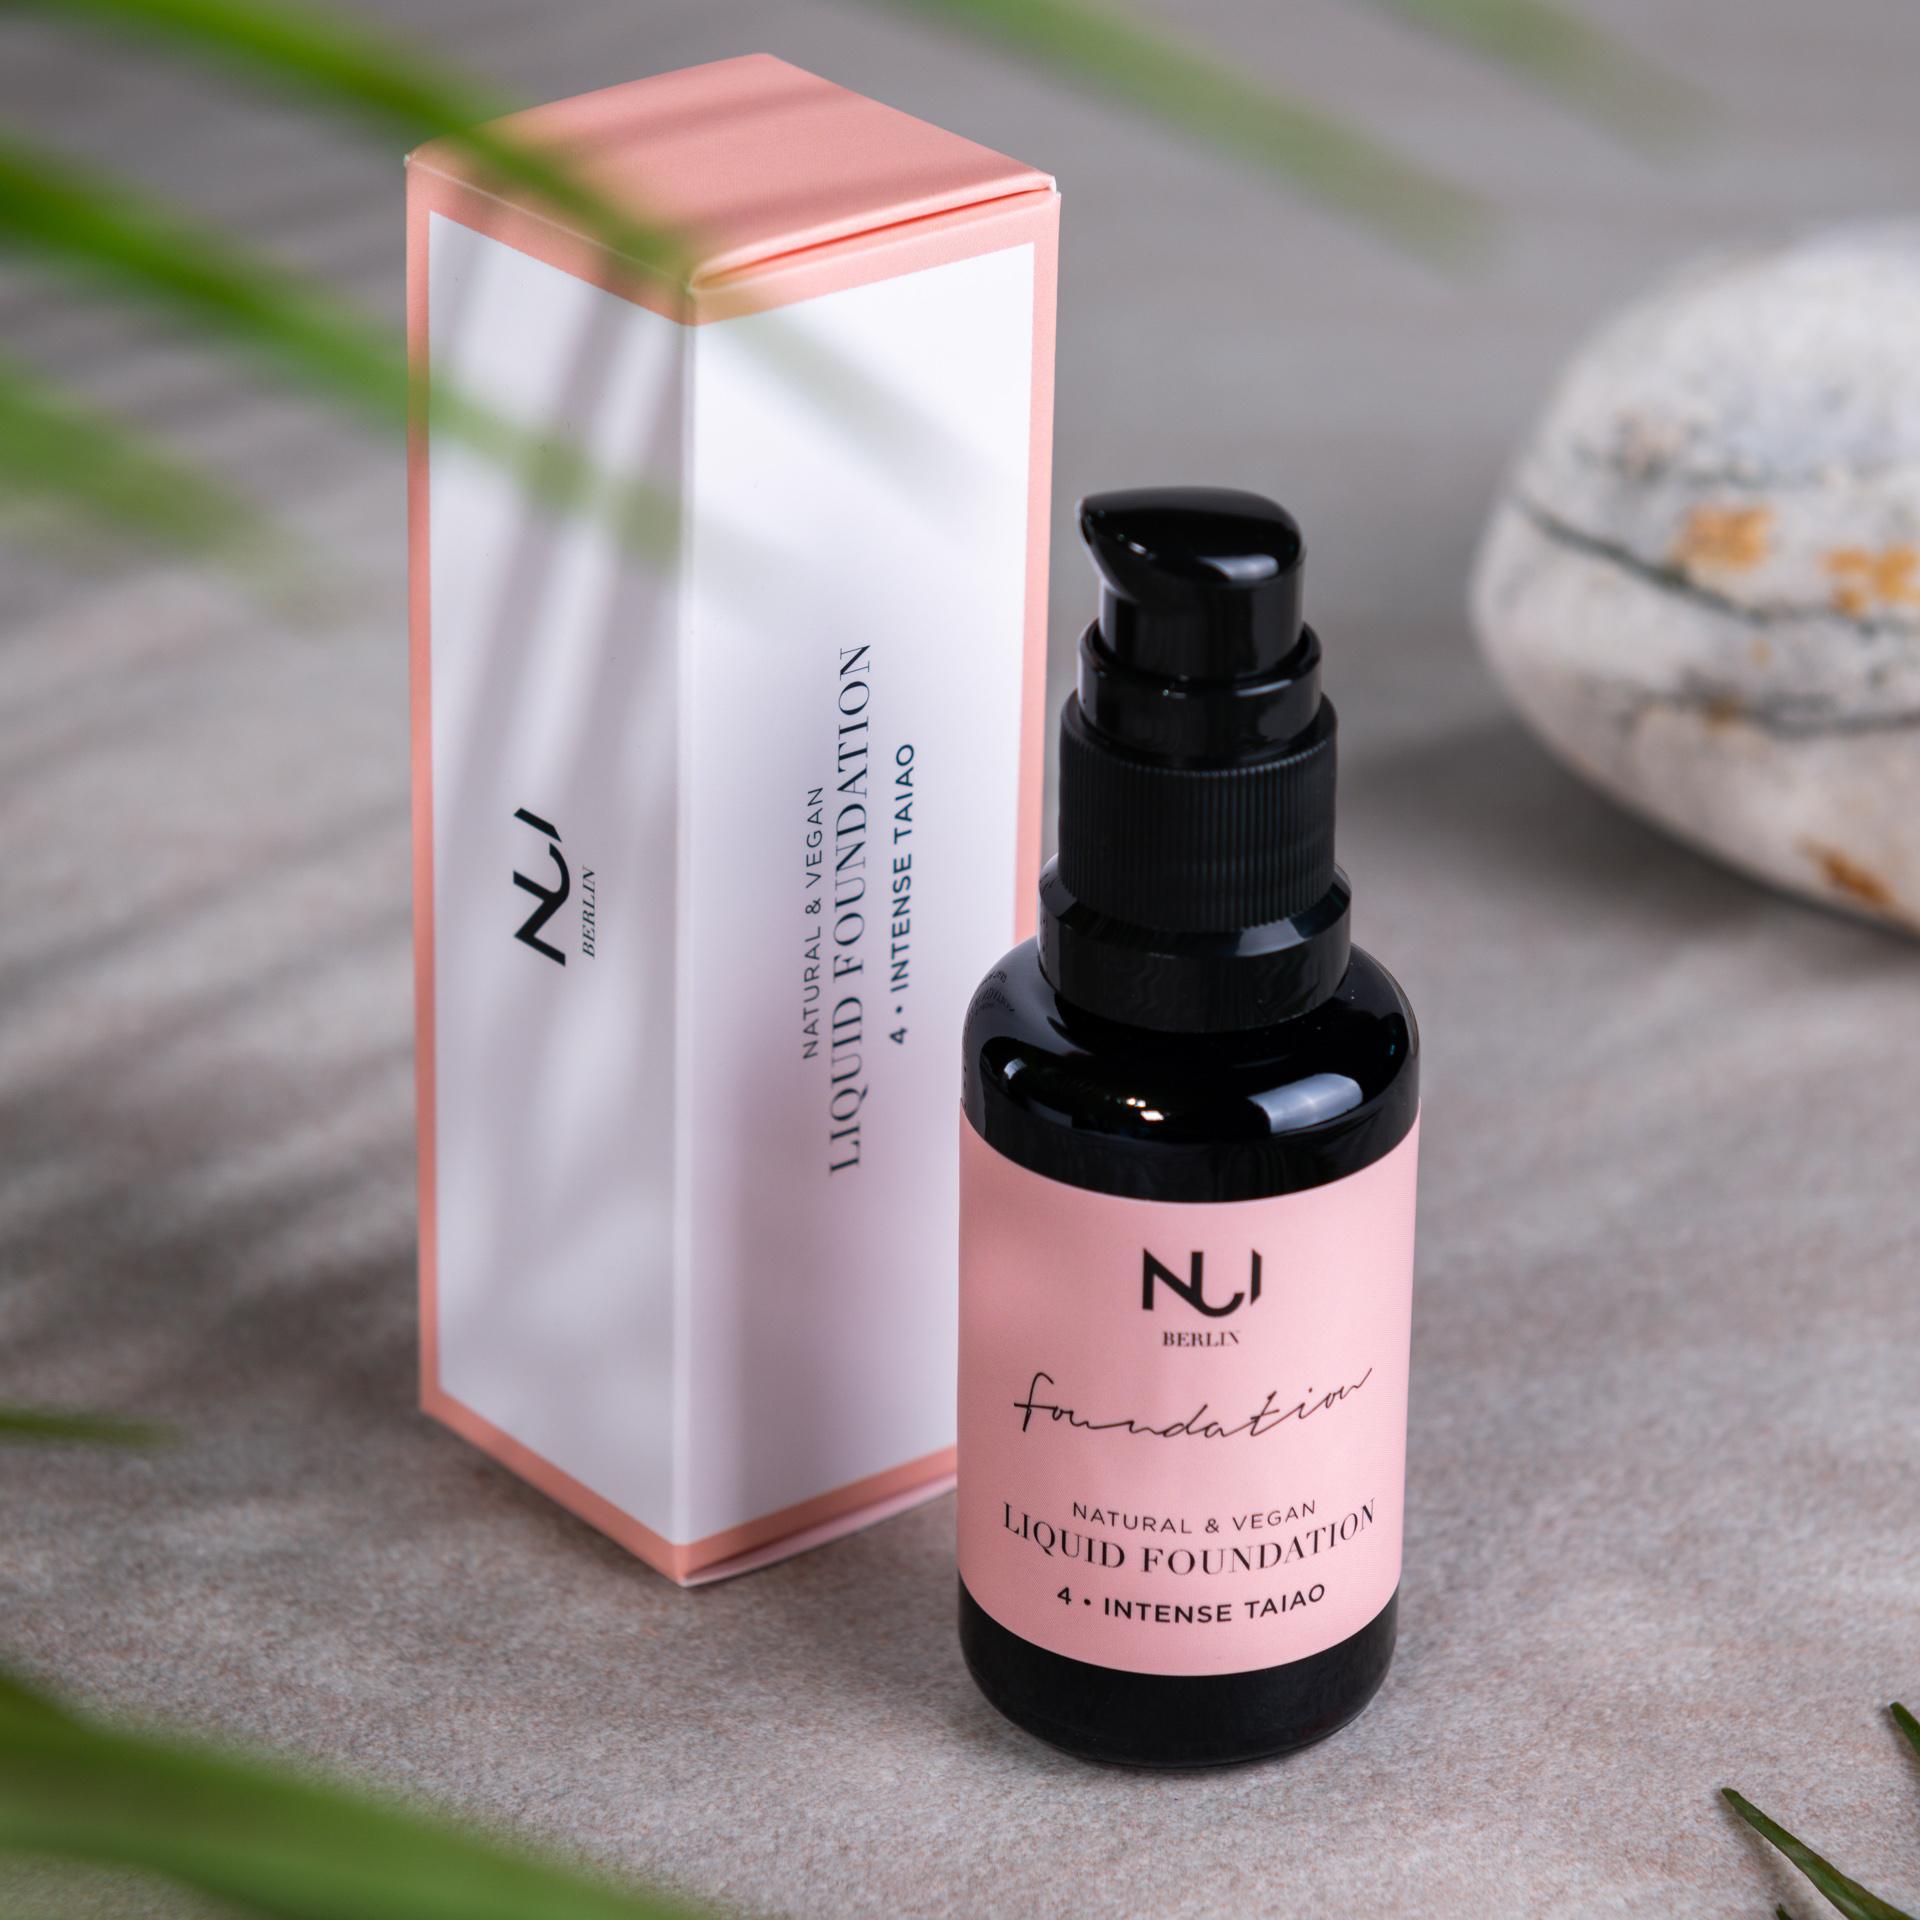 NUI Natural Liquid Foundation 04 INTENSE TAIAO